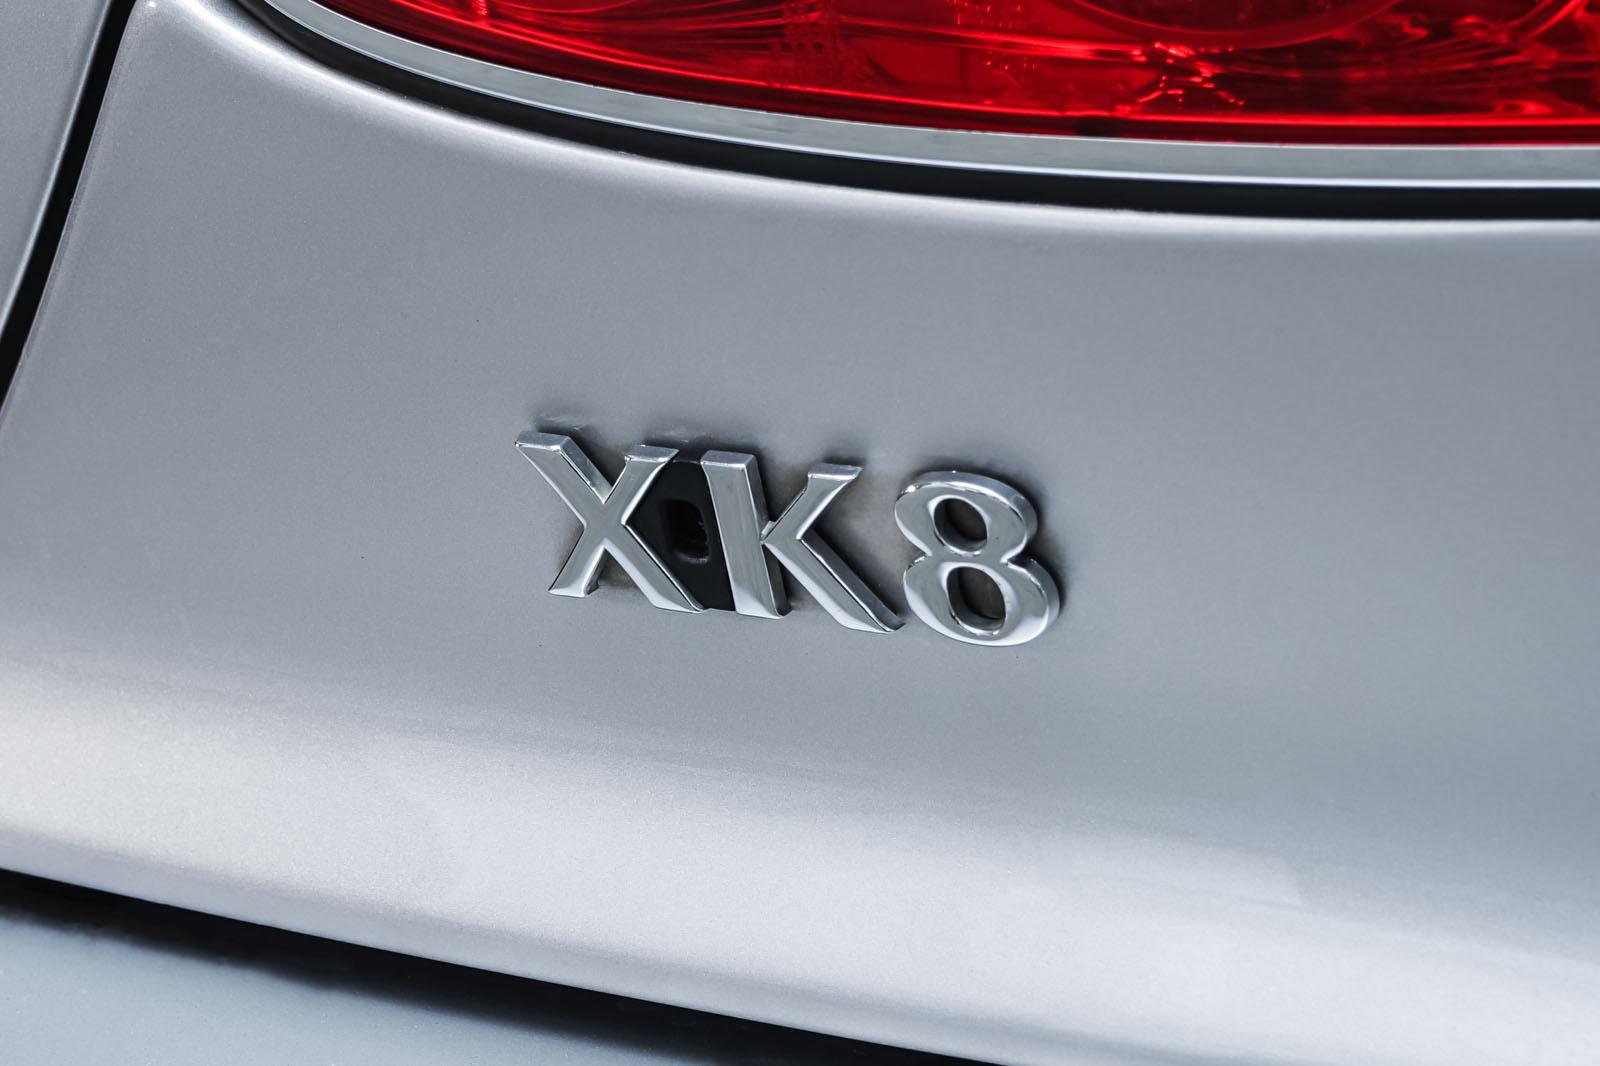 Jaguar_XK8_4.0_Silber_Schwarz_JAG-9731_23_w